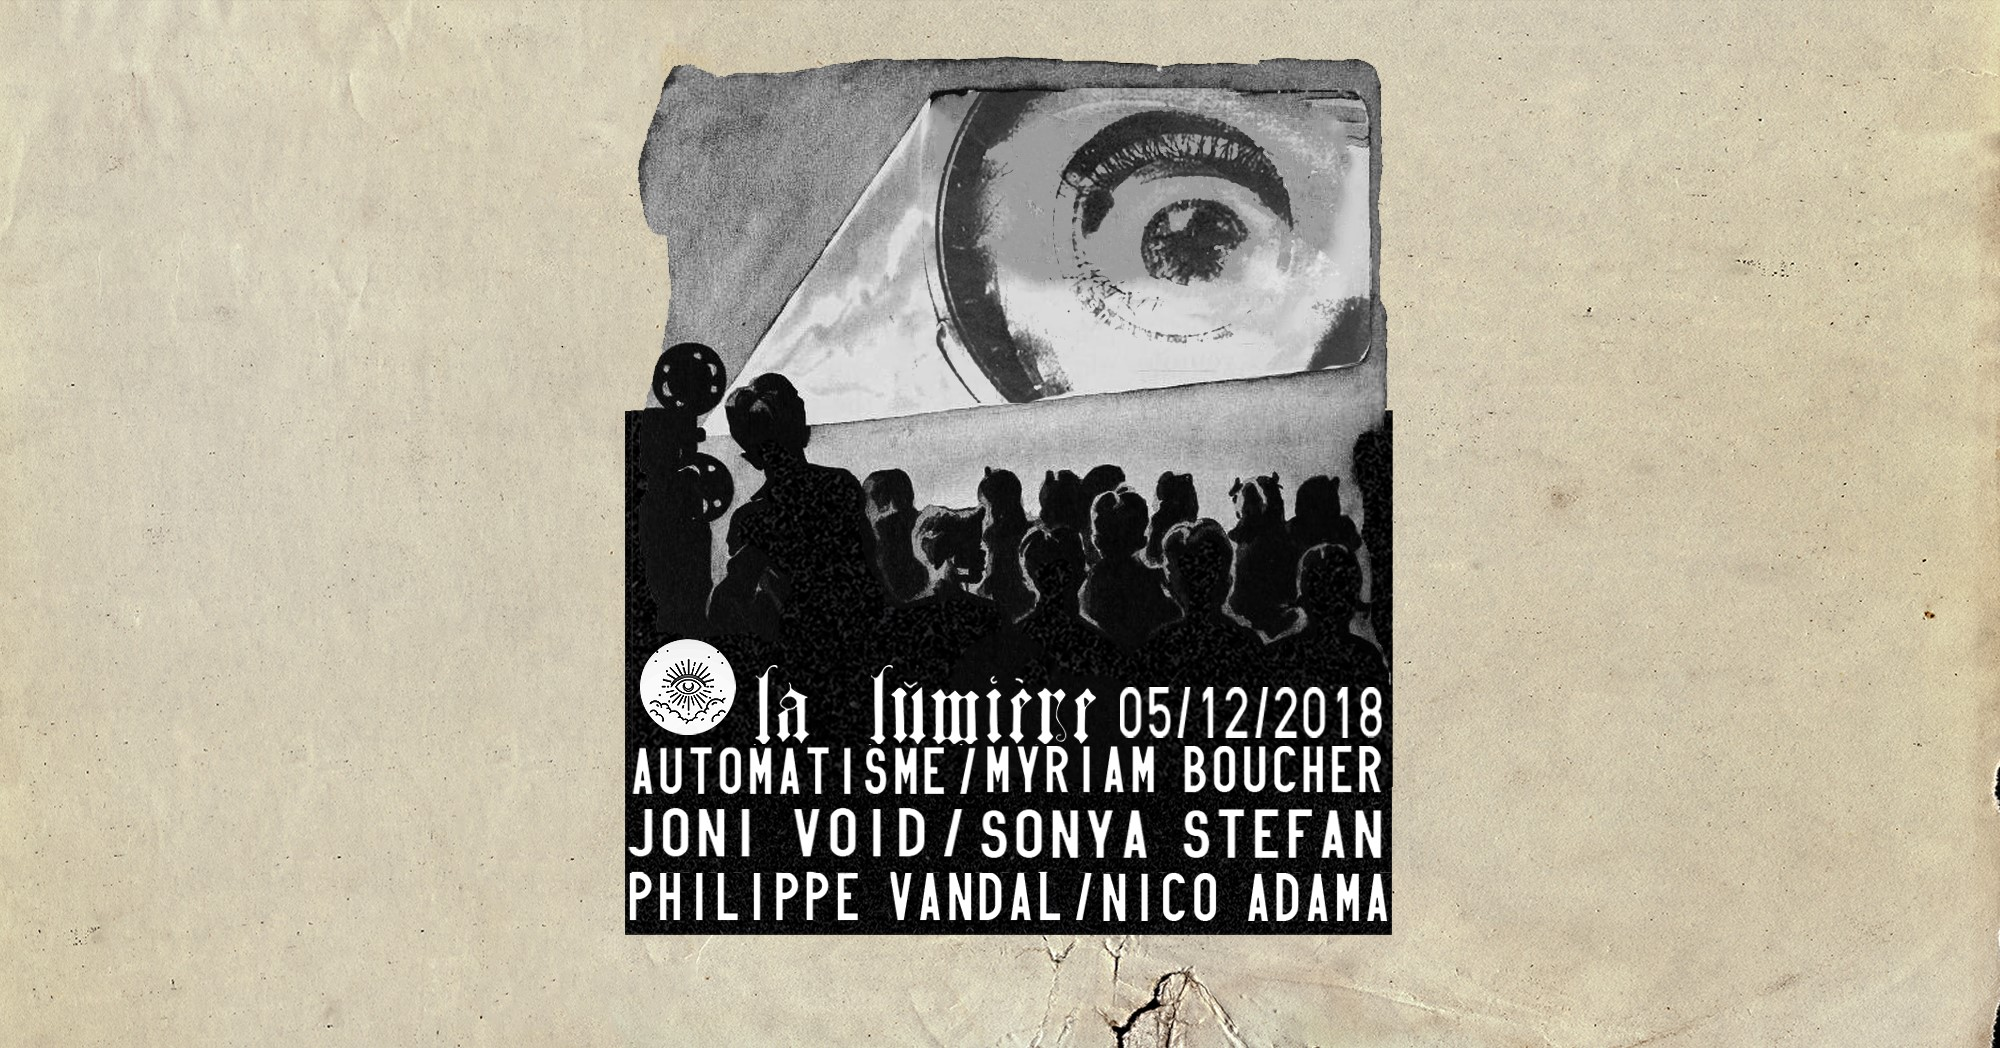 Automatisme/ Myriam Boucher + Joni Void / Sonya Stefan + Philippe Vandal / Nico Adama